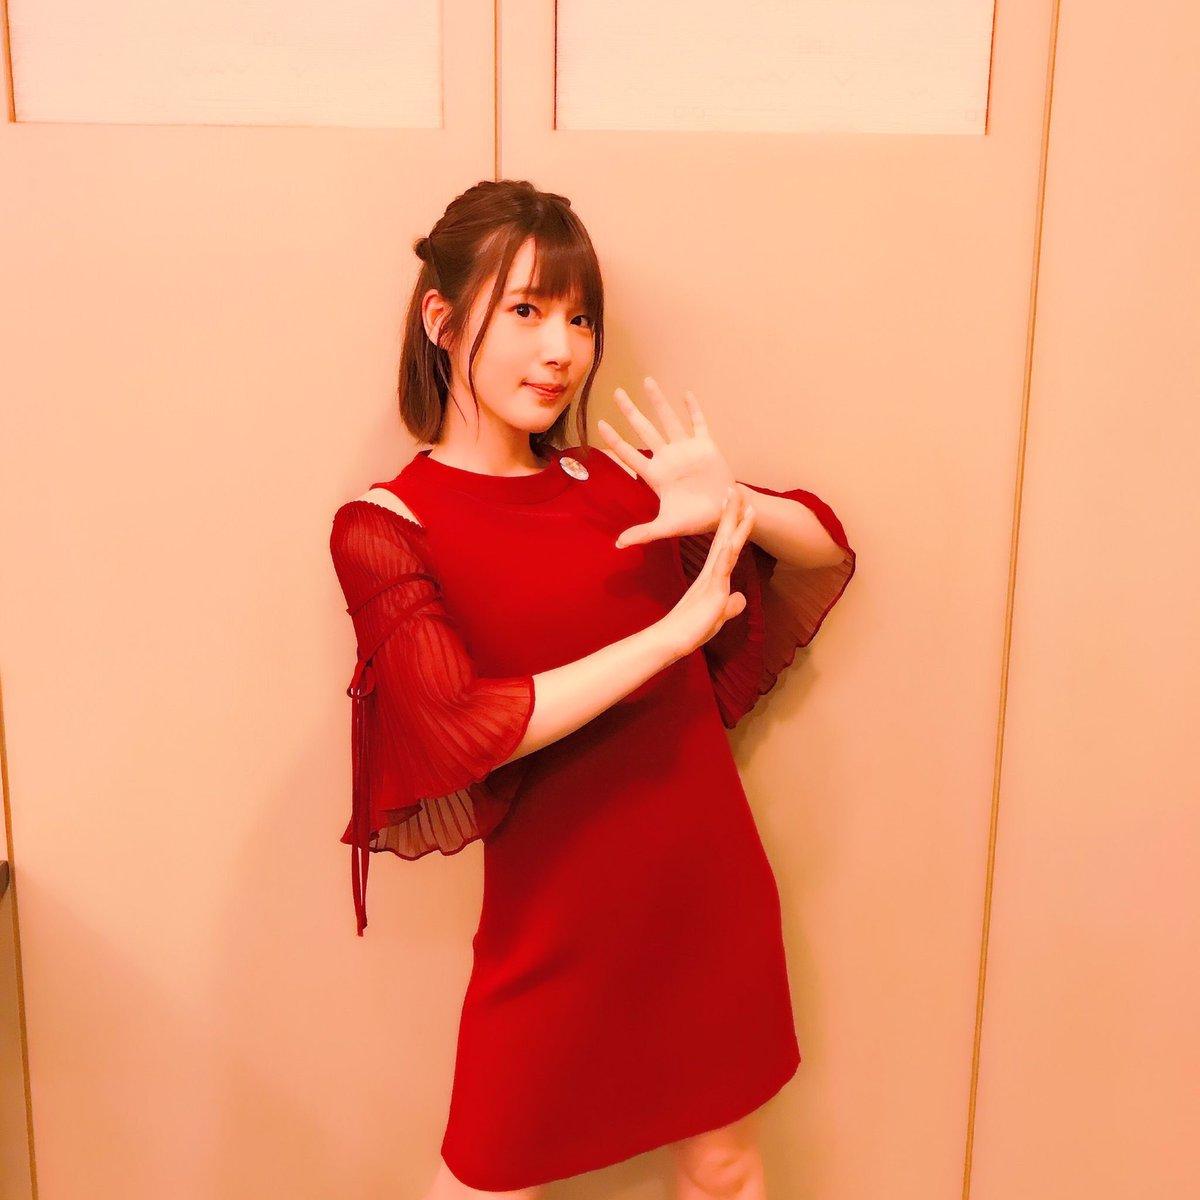 a1edbae743bb9 声優さんと服 on Twitter